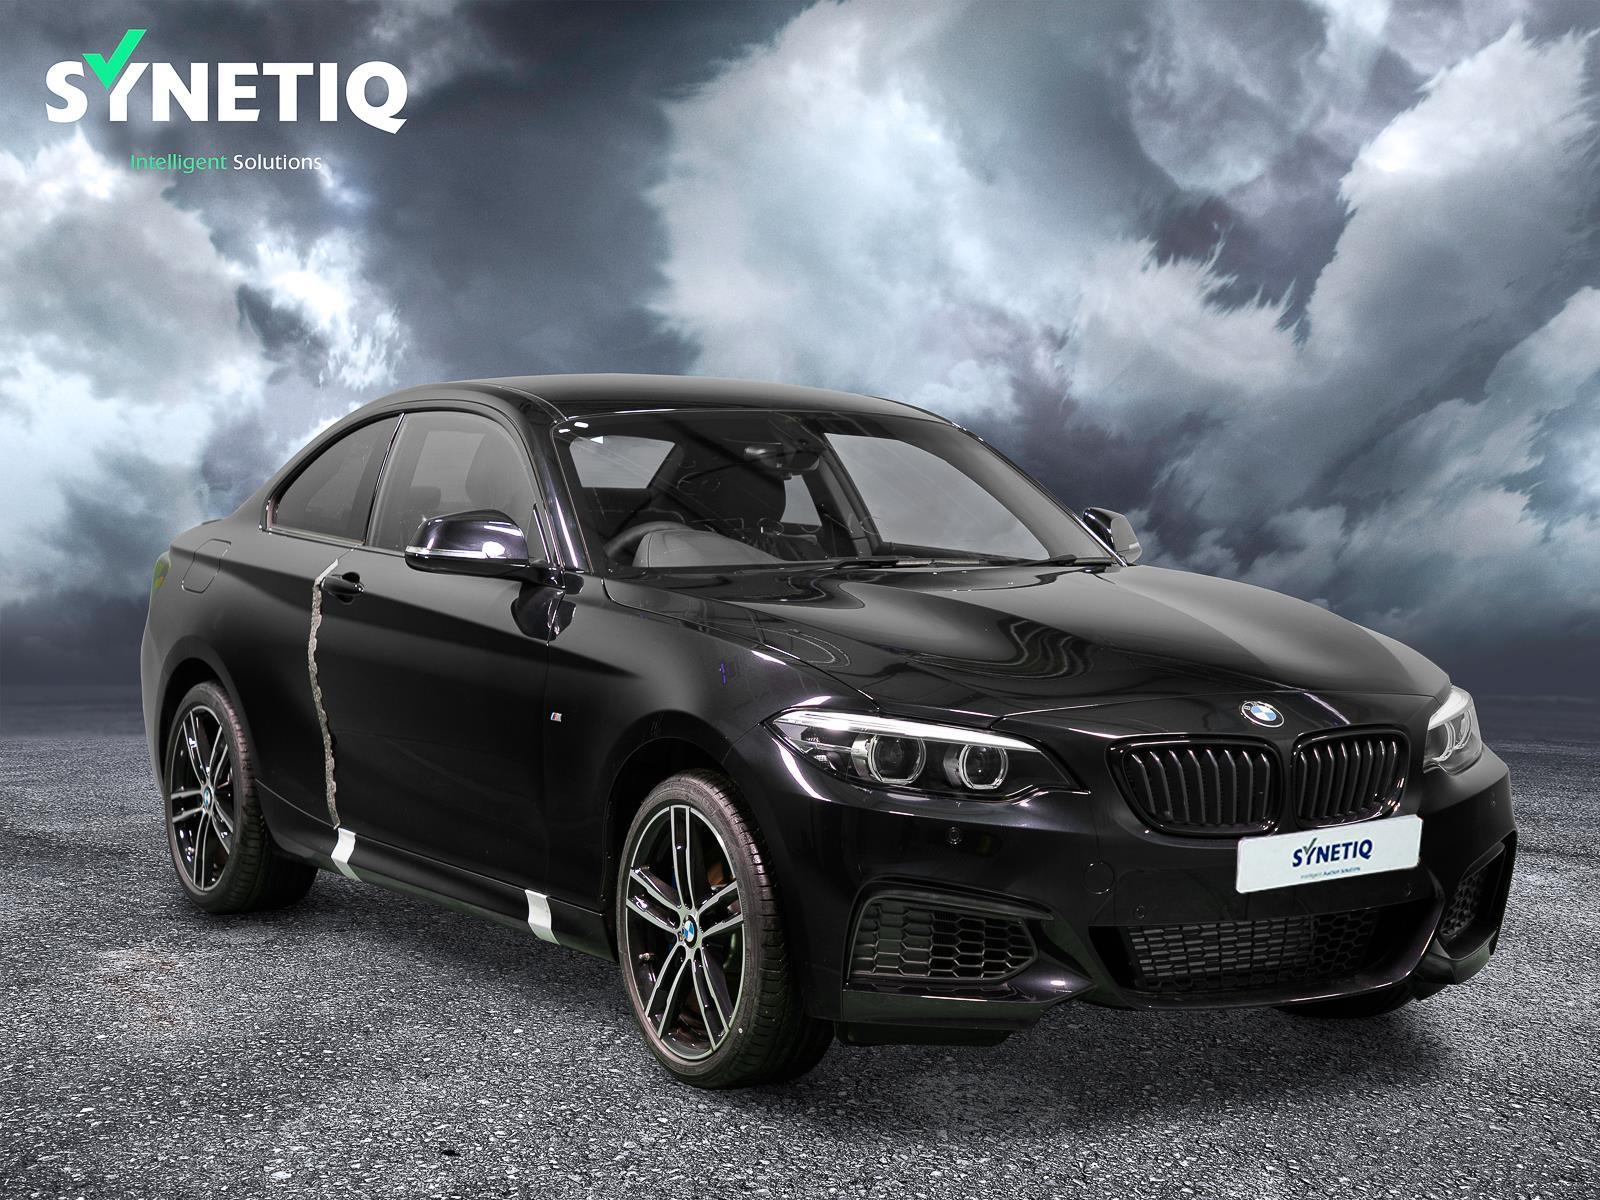 2020 BMW 2 SERIES 218I M SPORT 1499cc TURBO PETROL MANUAL 2 DOOR COUPE